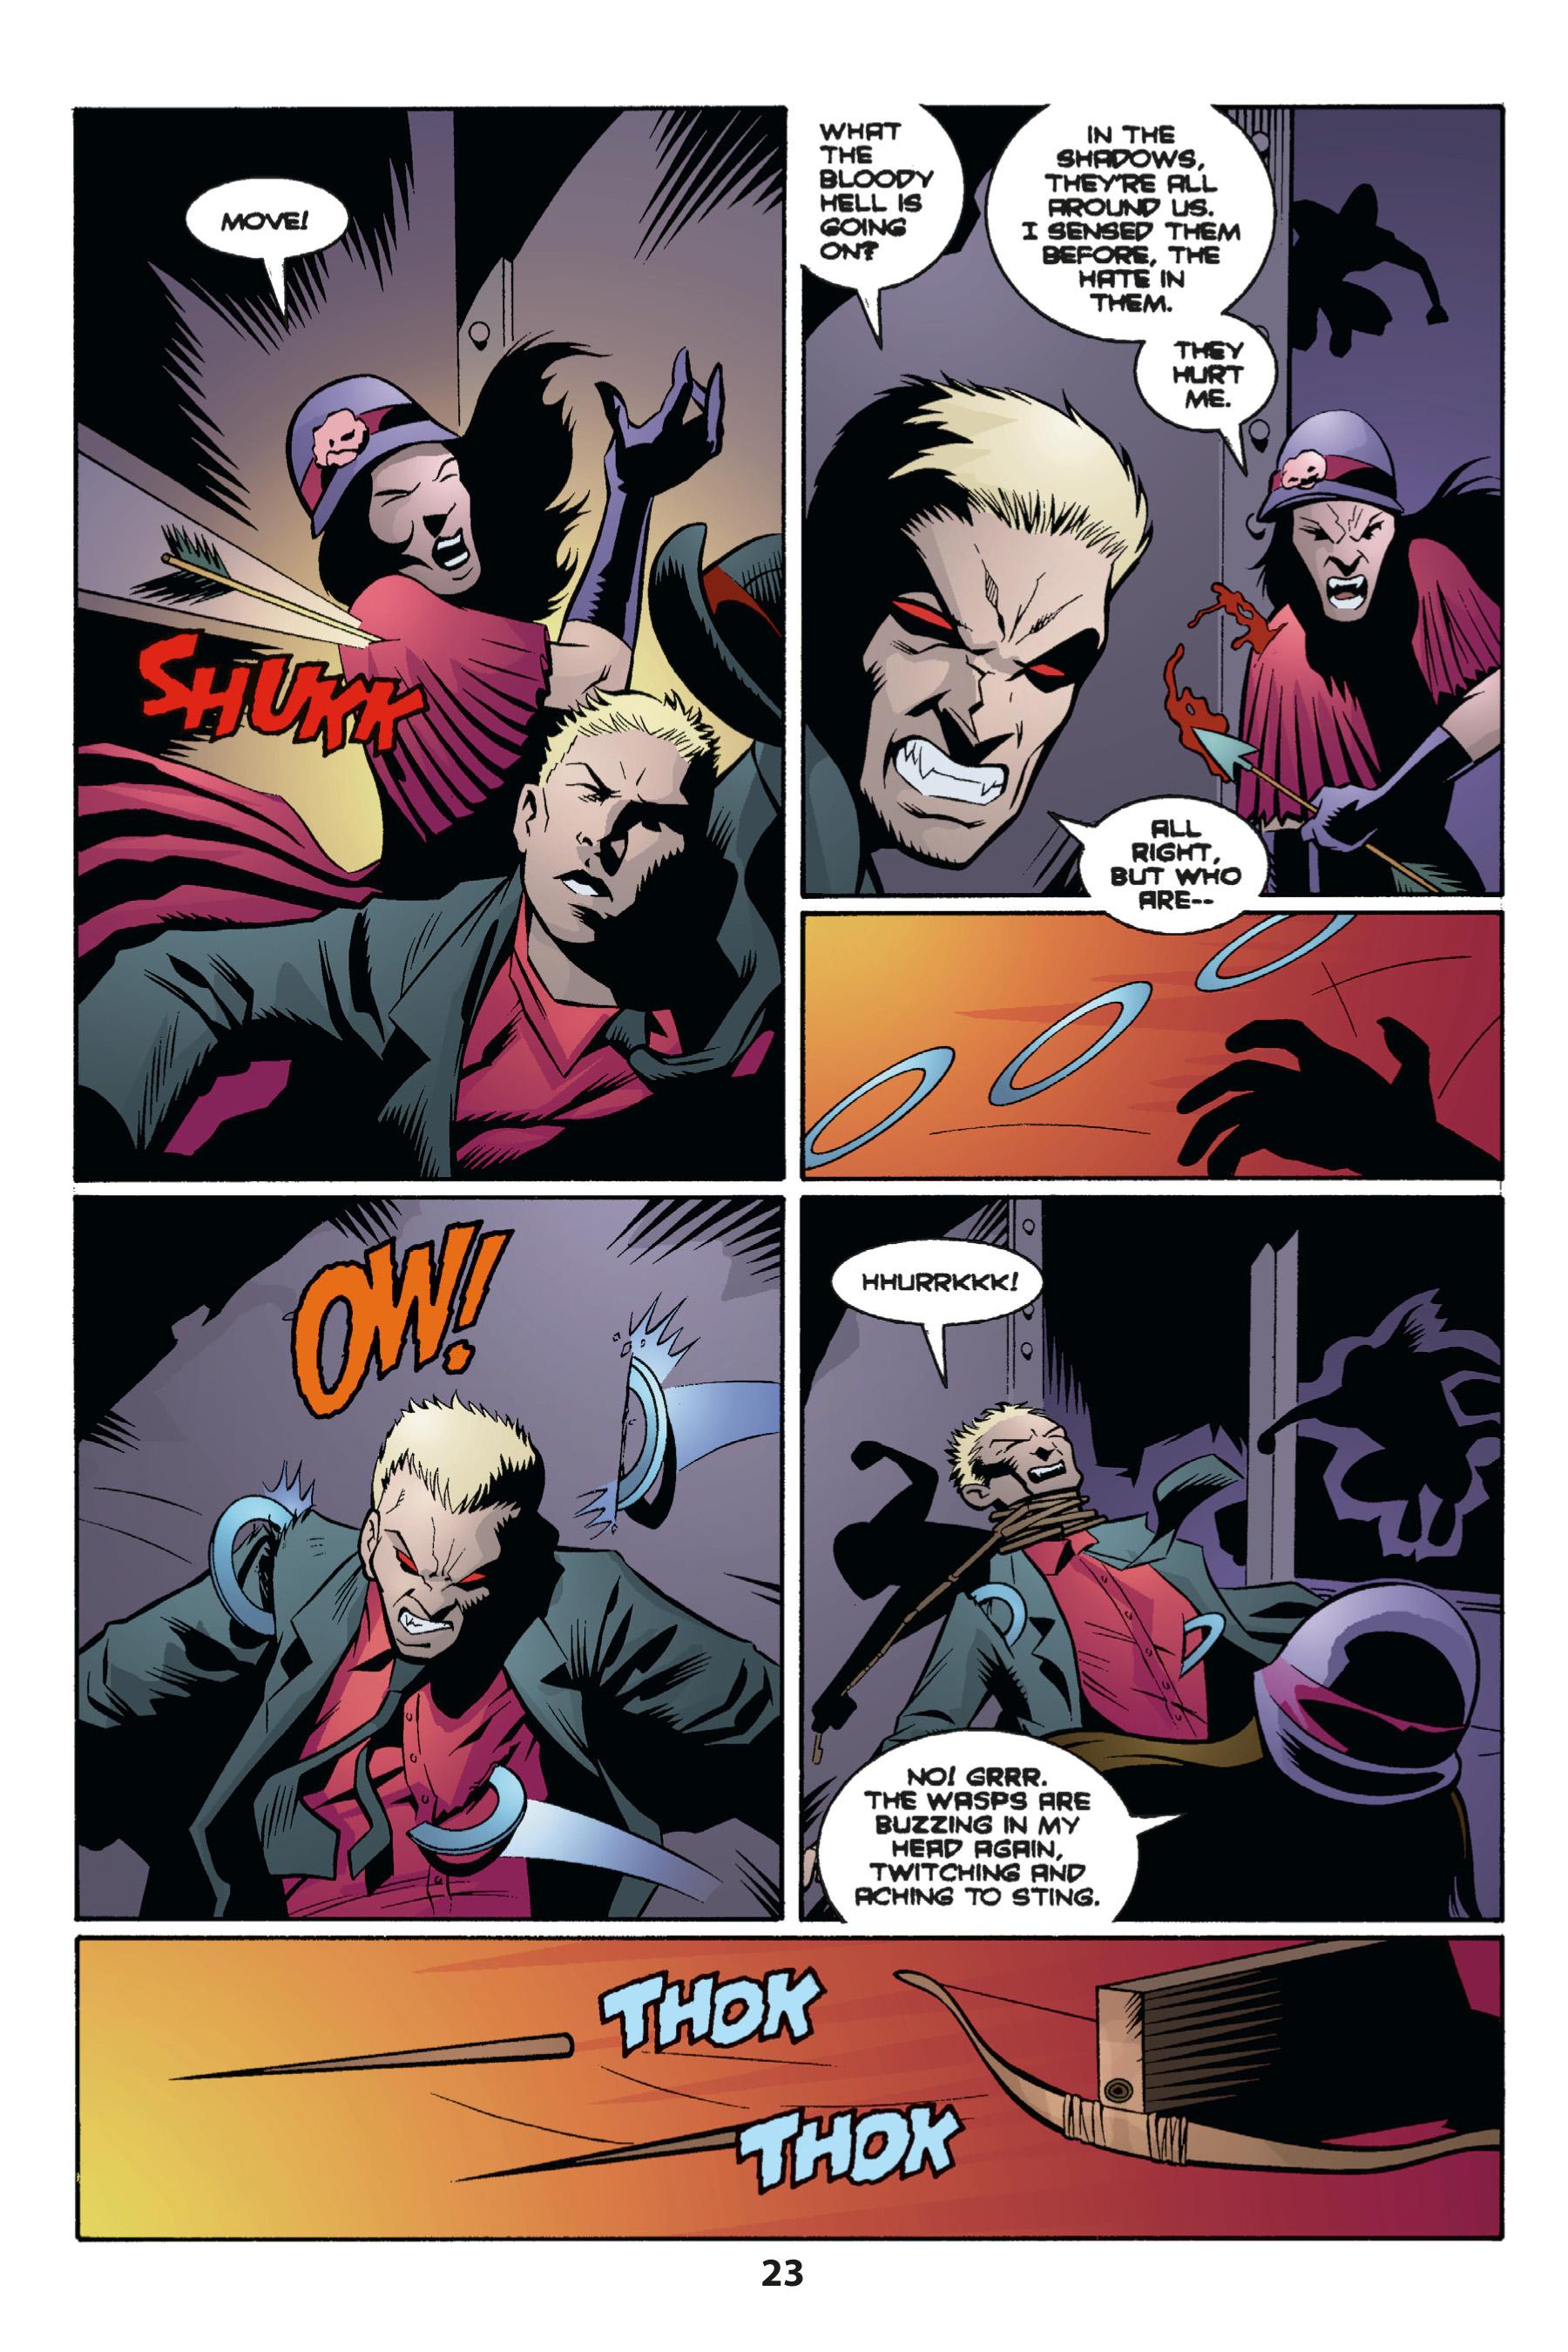 Read online Buffy the Vampire Slayer: Omnibus comic -  Issue # TPB 1 - 25